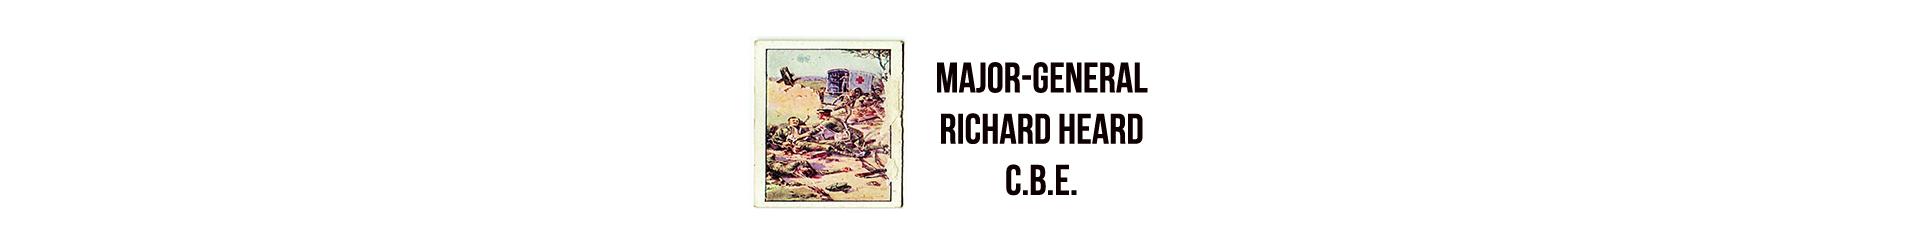 Major-General Richard Heard C.B.E.